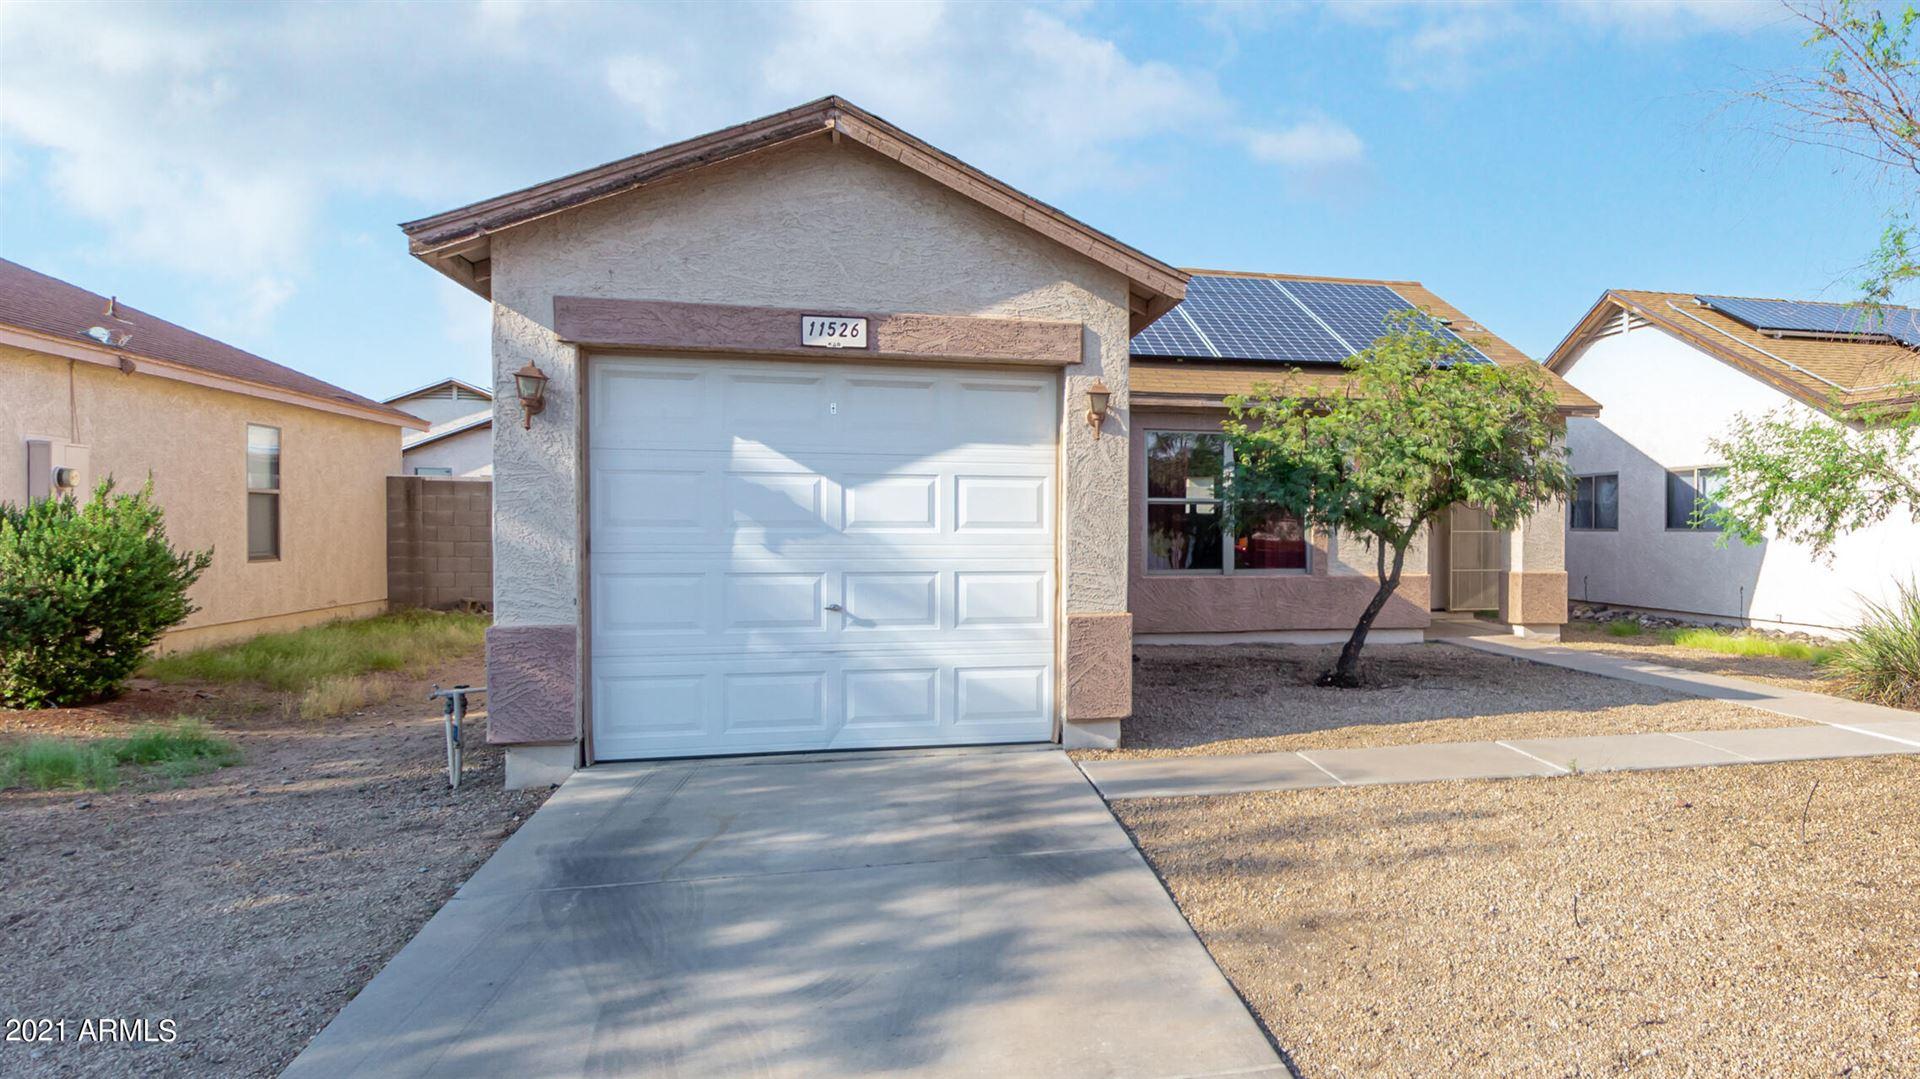 Photo of 11526 W LARKSPUR Road, El Mirage, AZ 85335 (MLS # 6290772)